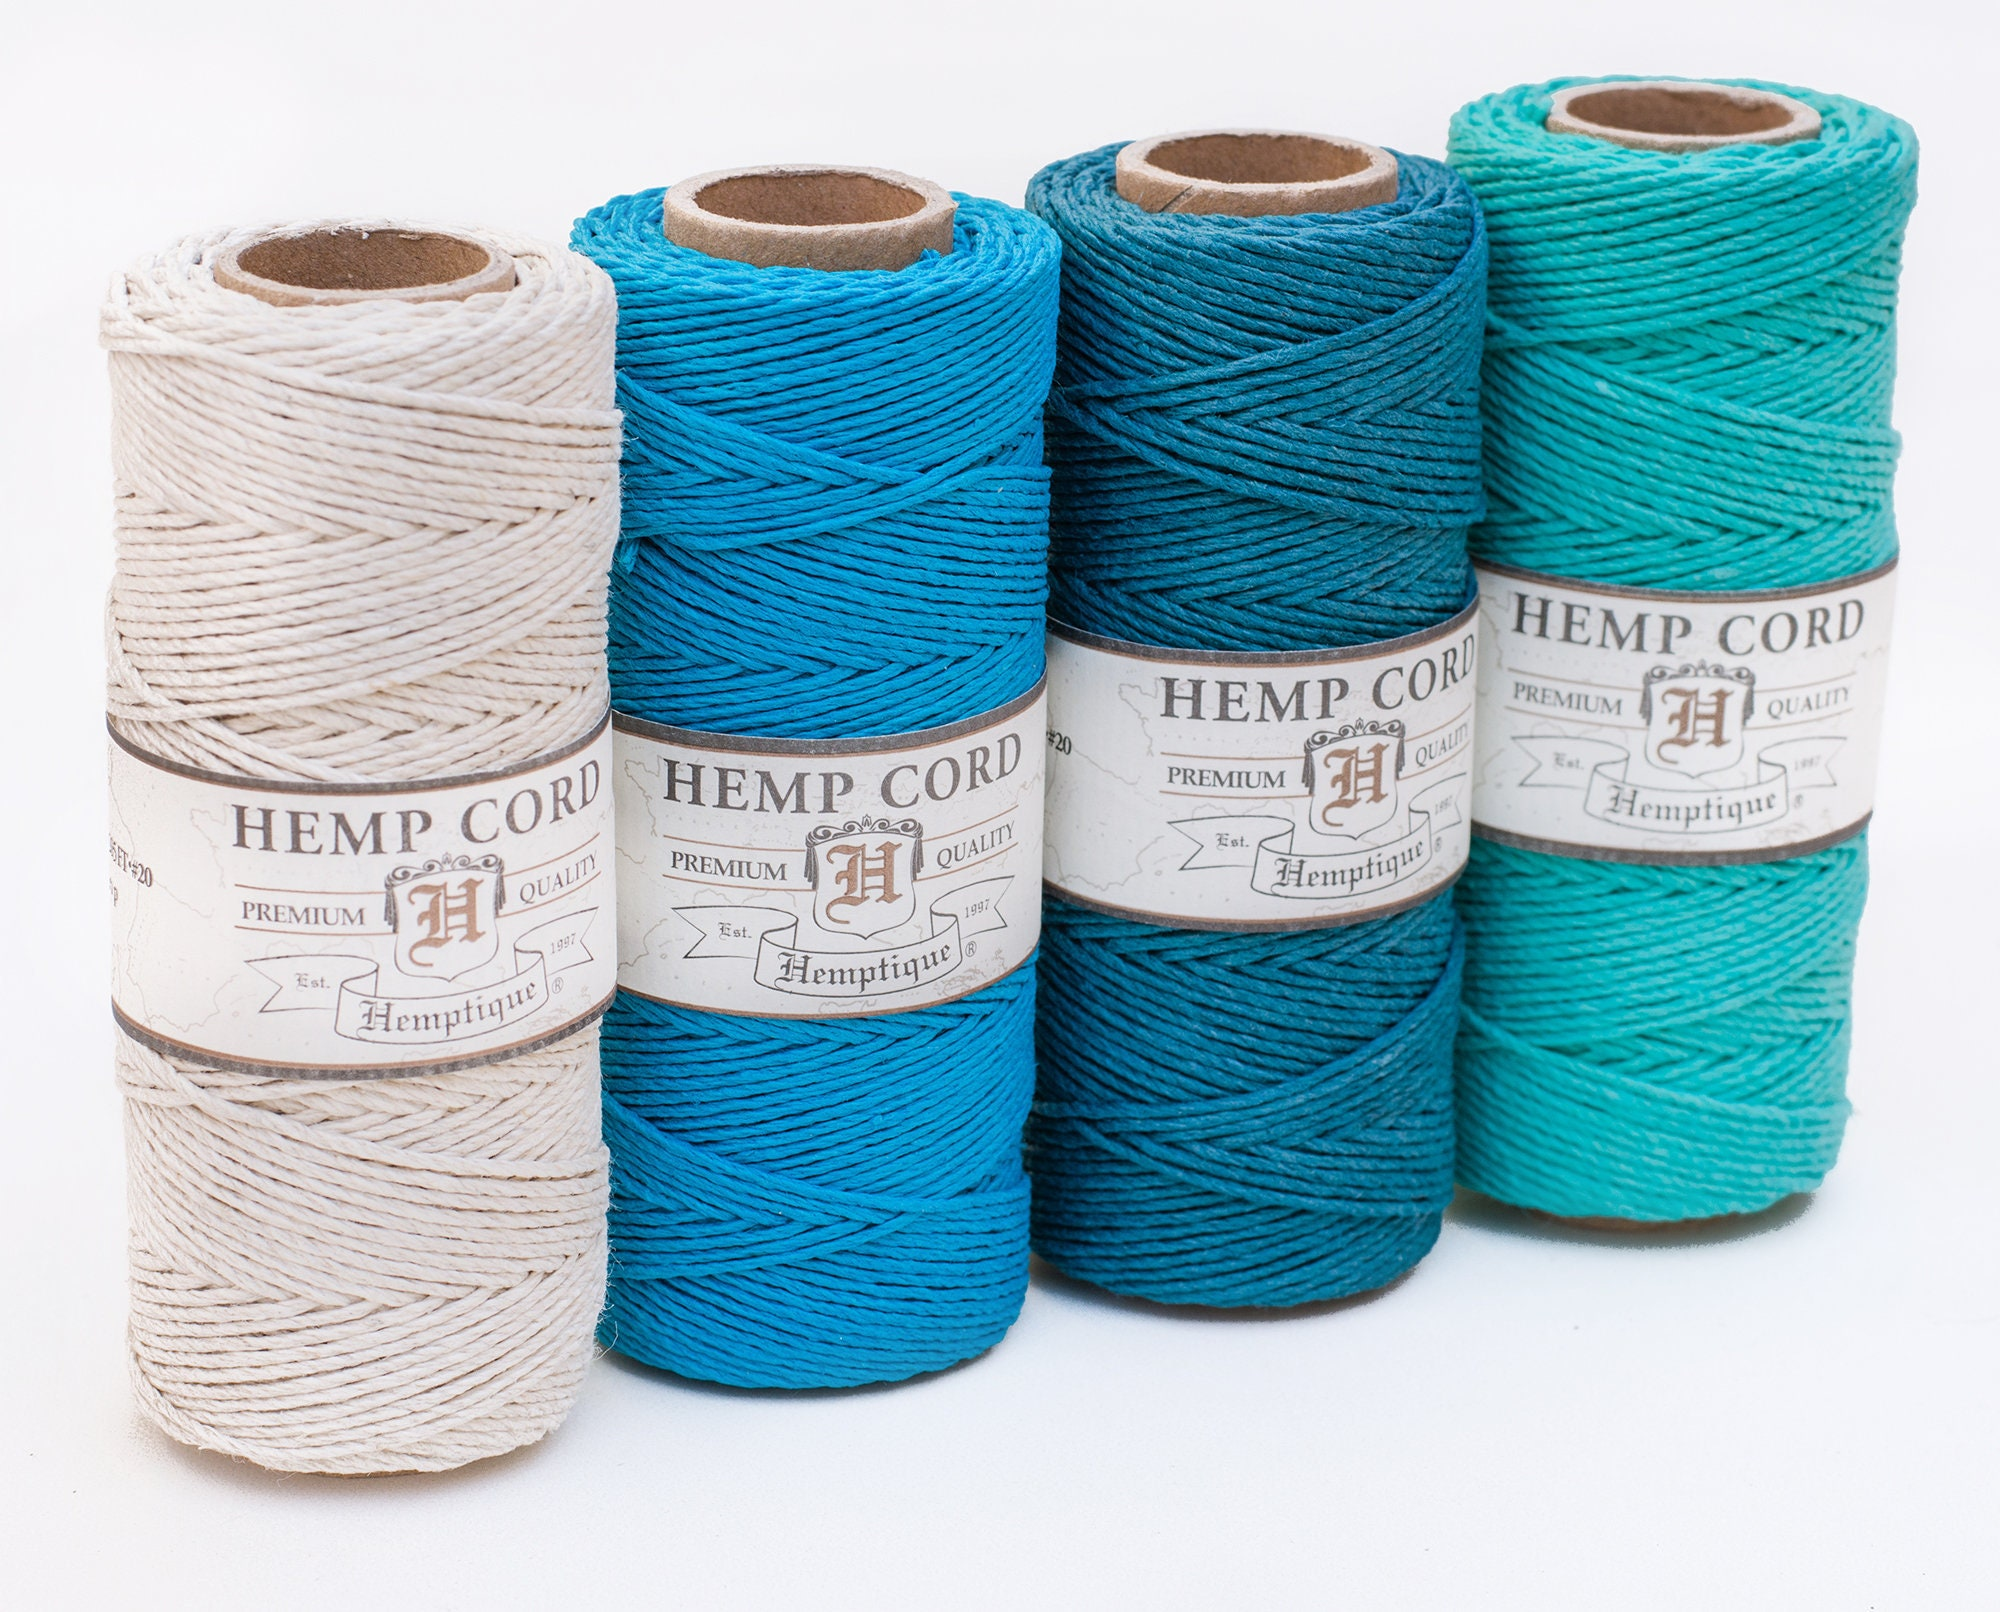 Colored Hemp Twine 1mm 4 Spool Pack Hemp Cord pack | Etsy